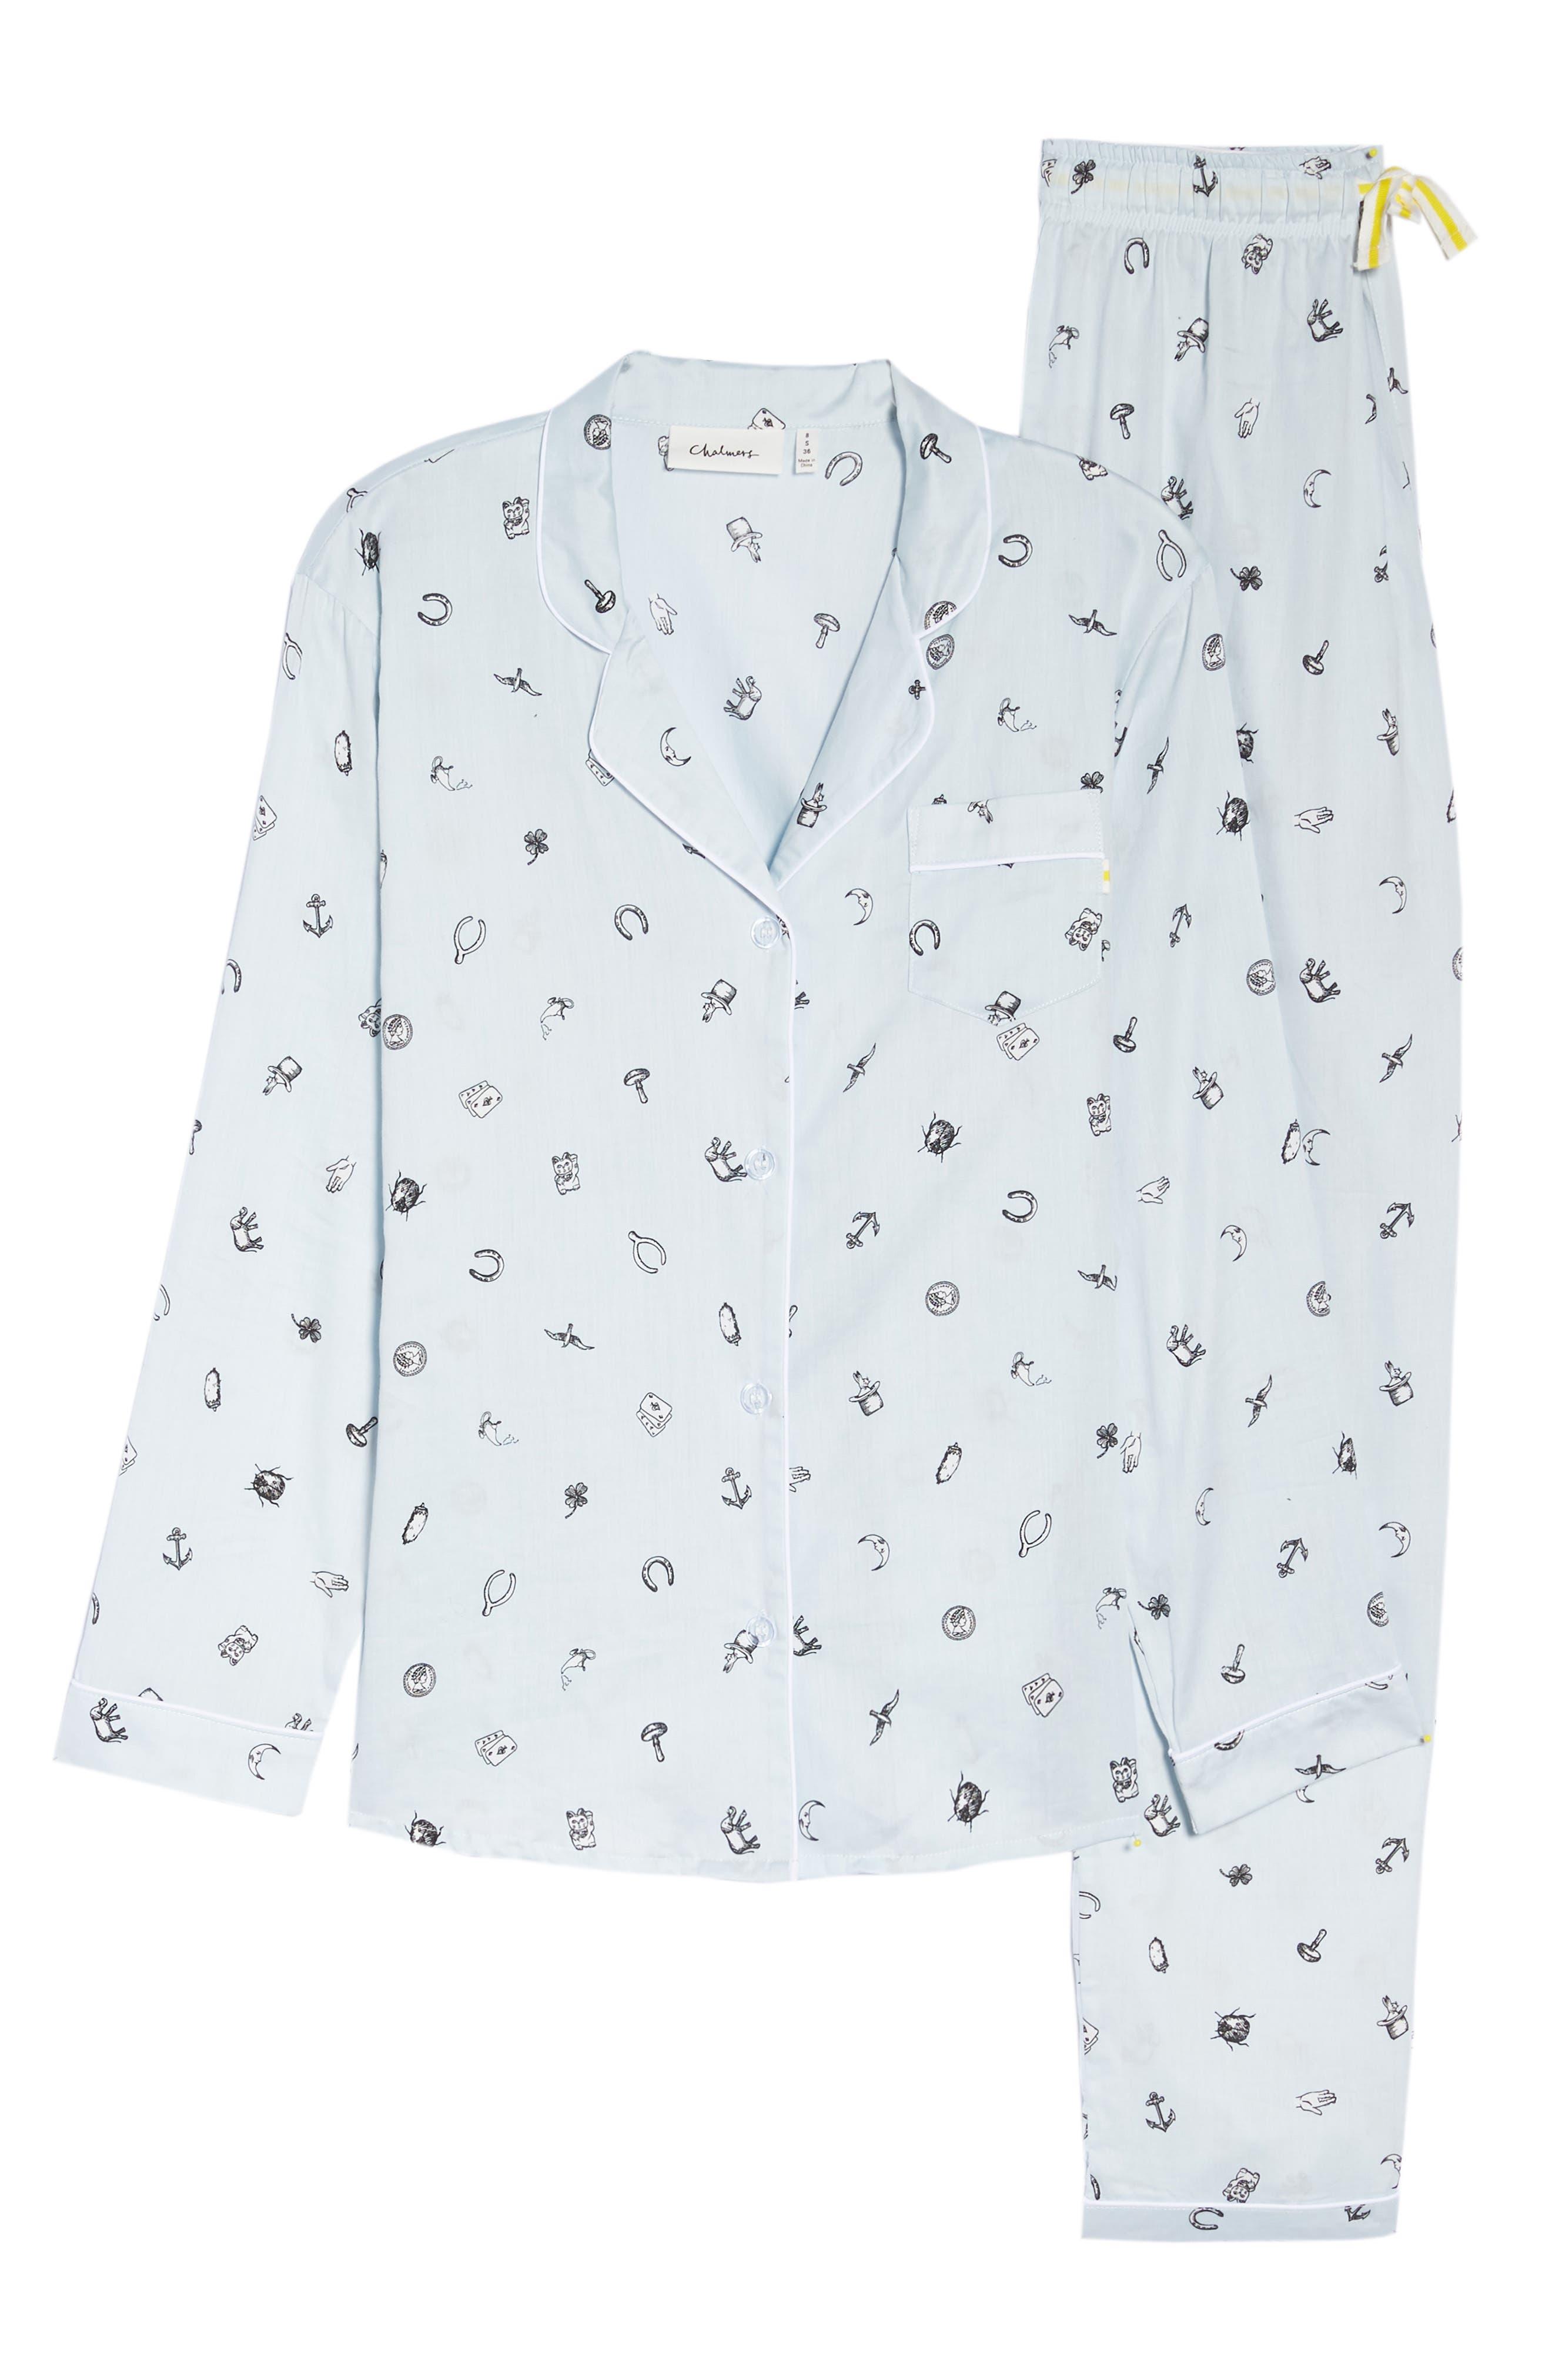 Charms Pajamas,                             Alternate thumbnail 4, color,                             Charms Lt Blue